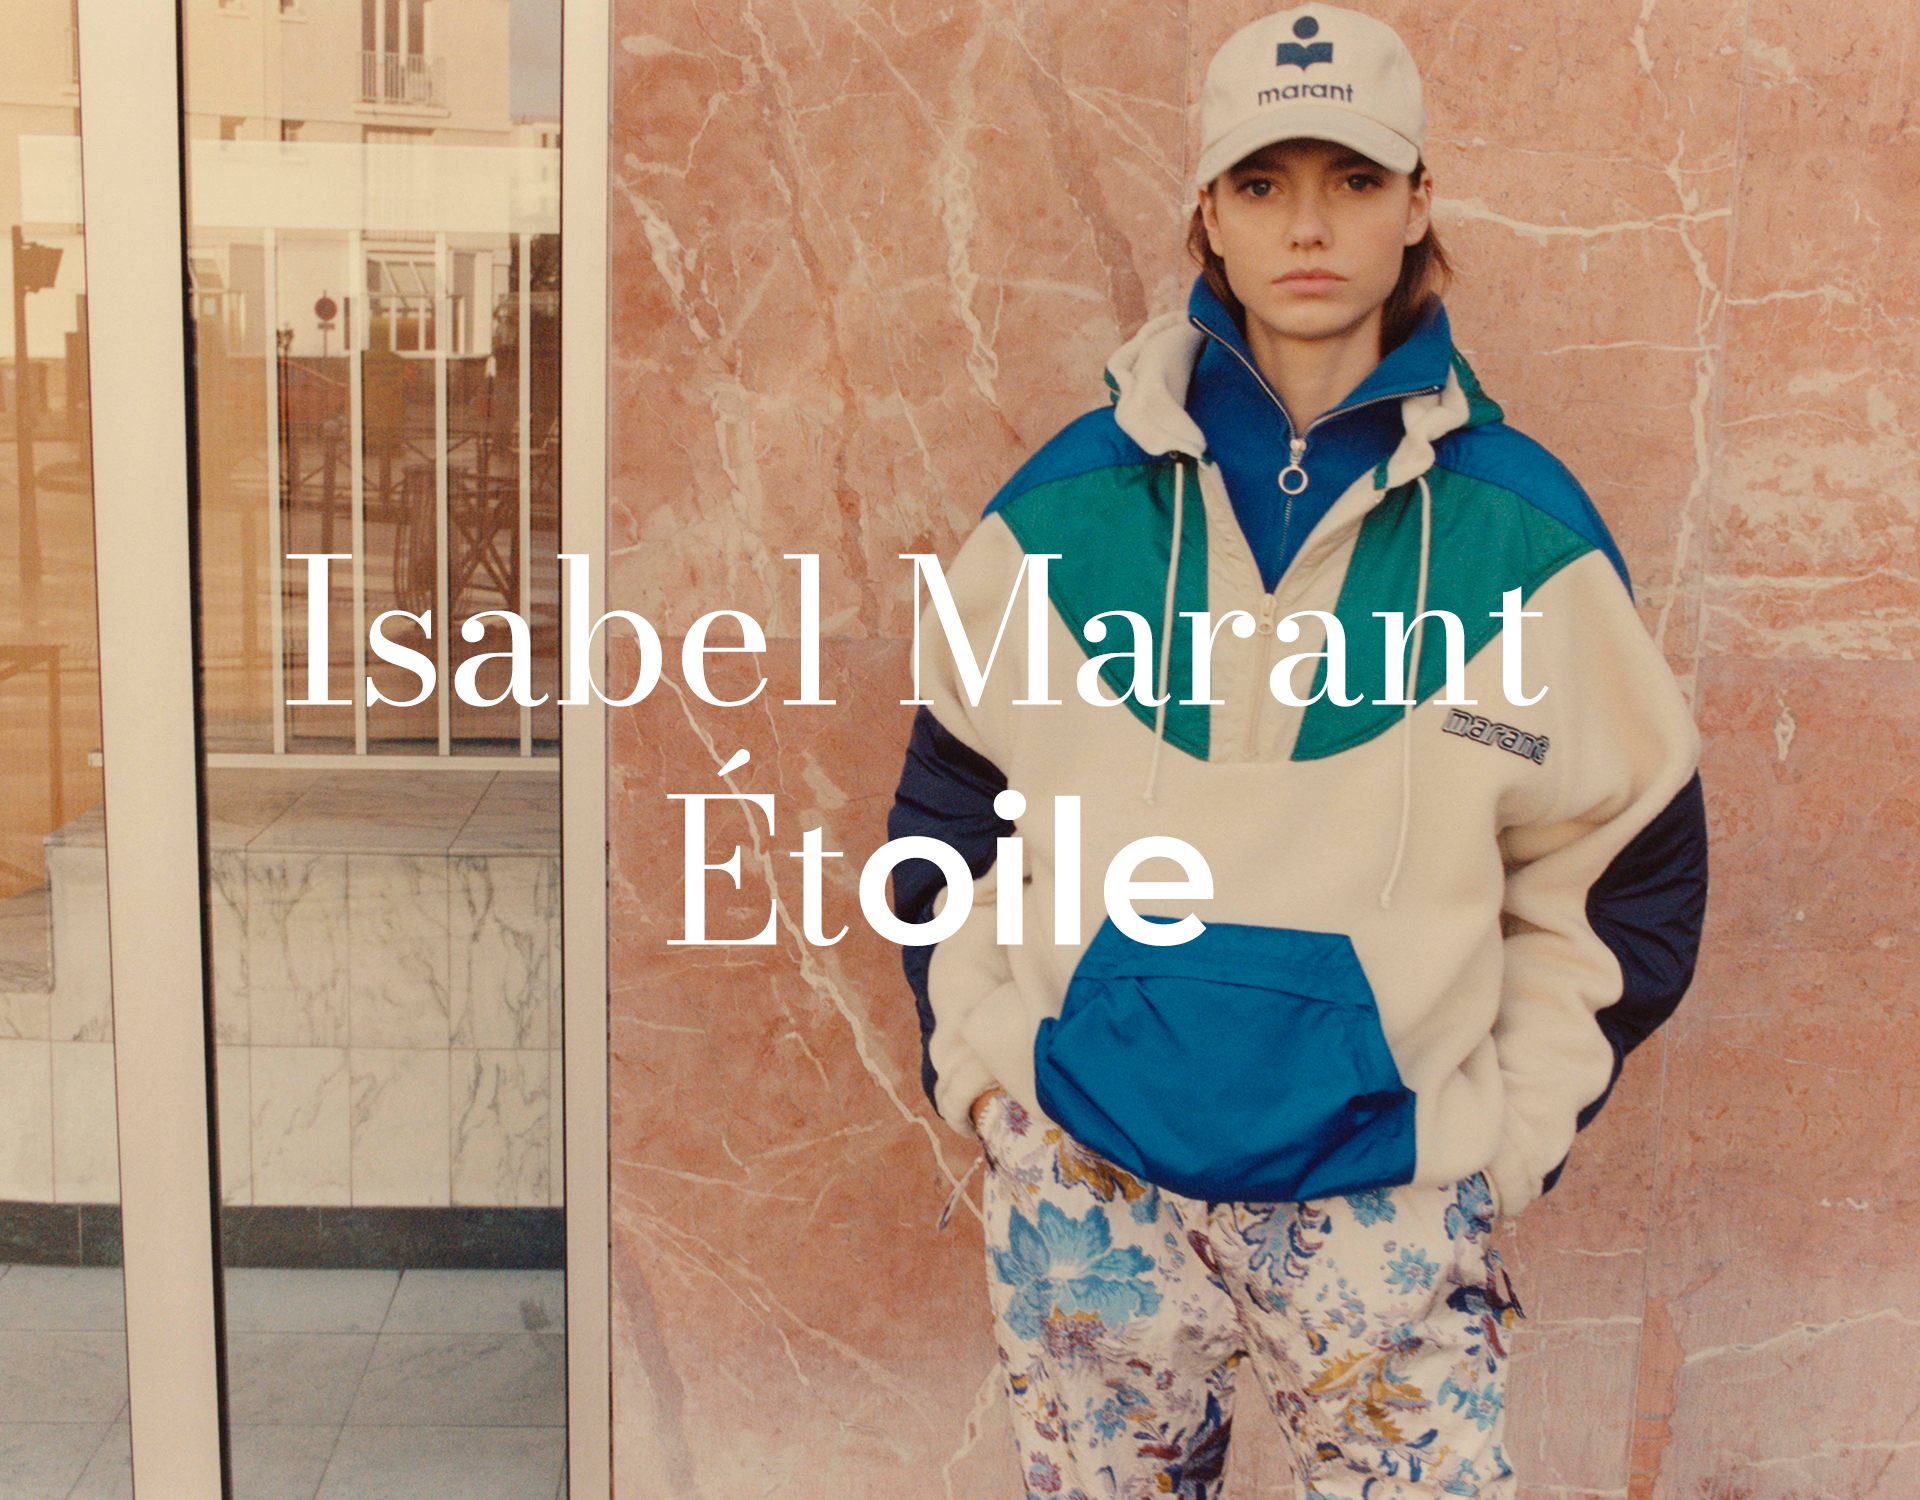 Model trägt Isabel Marant Étoile Outfit aus der Kollektion 2021